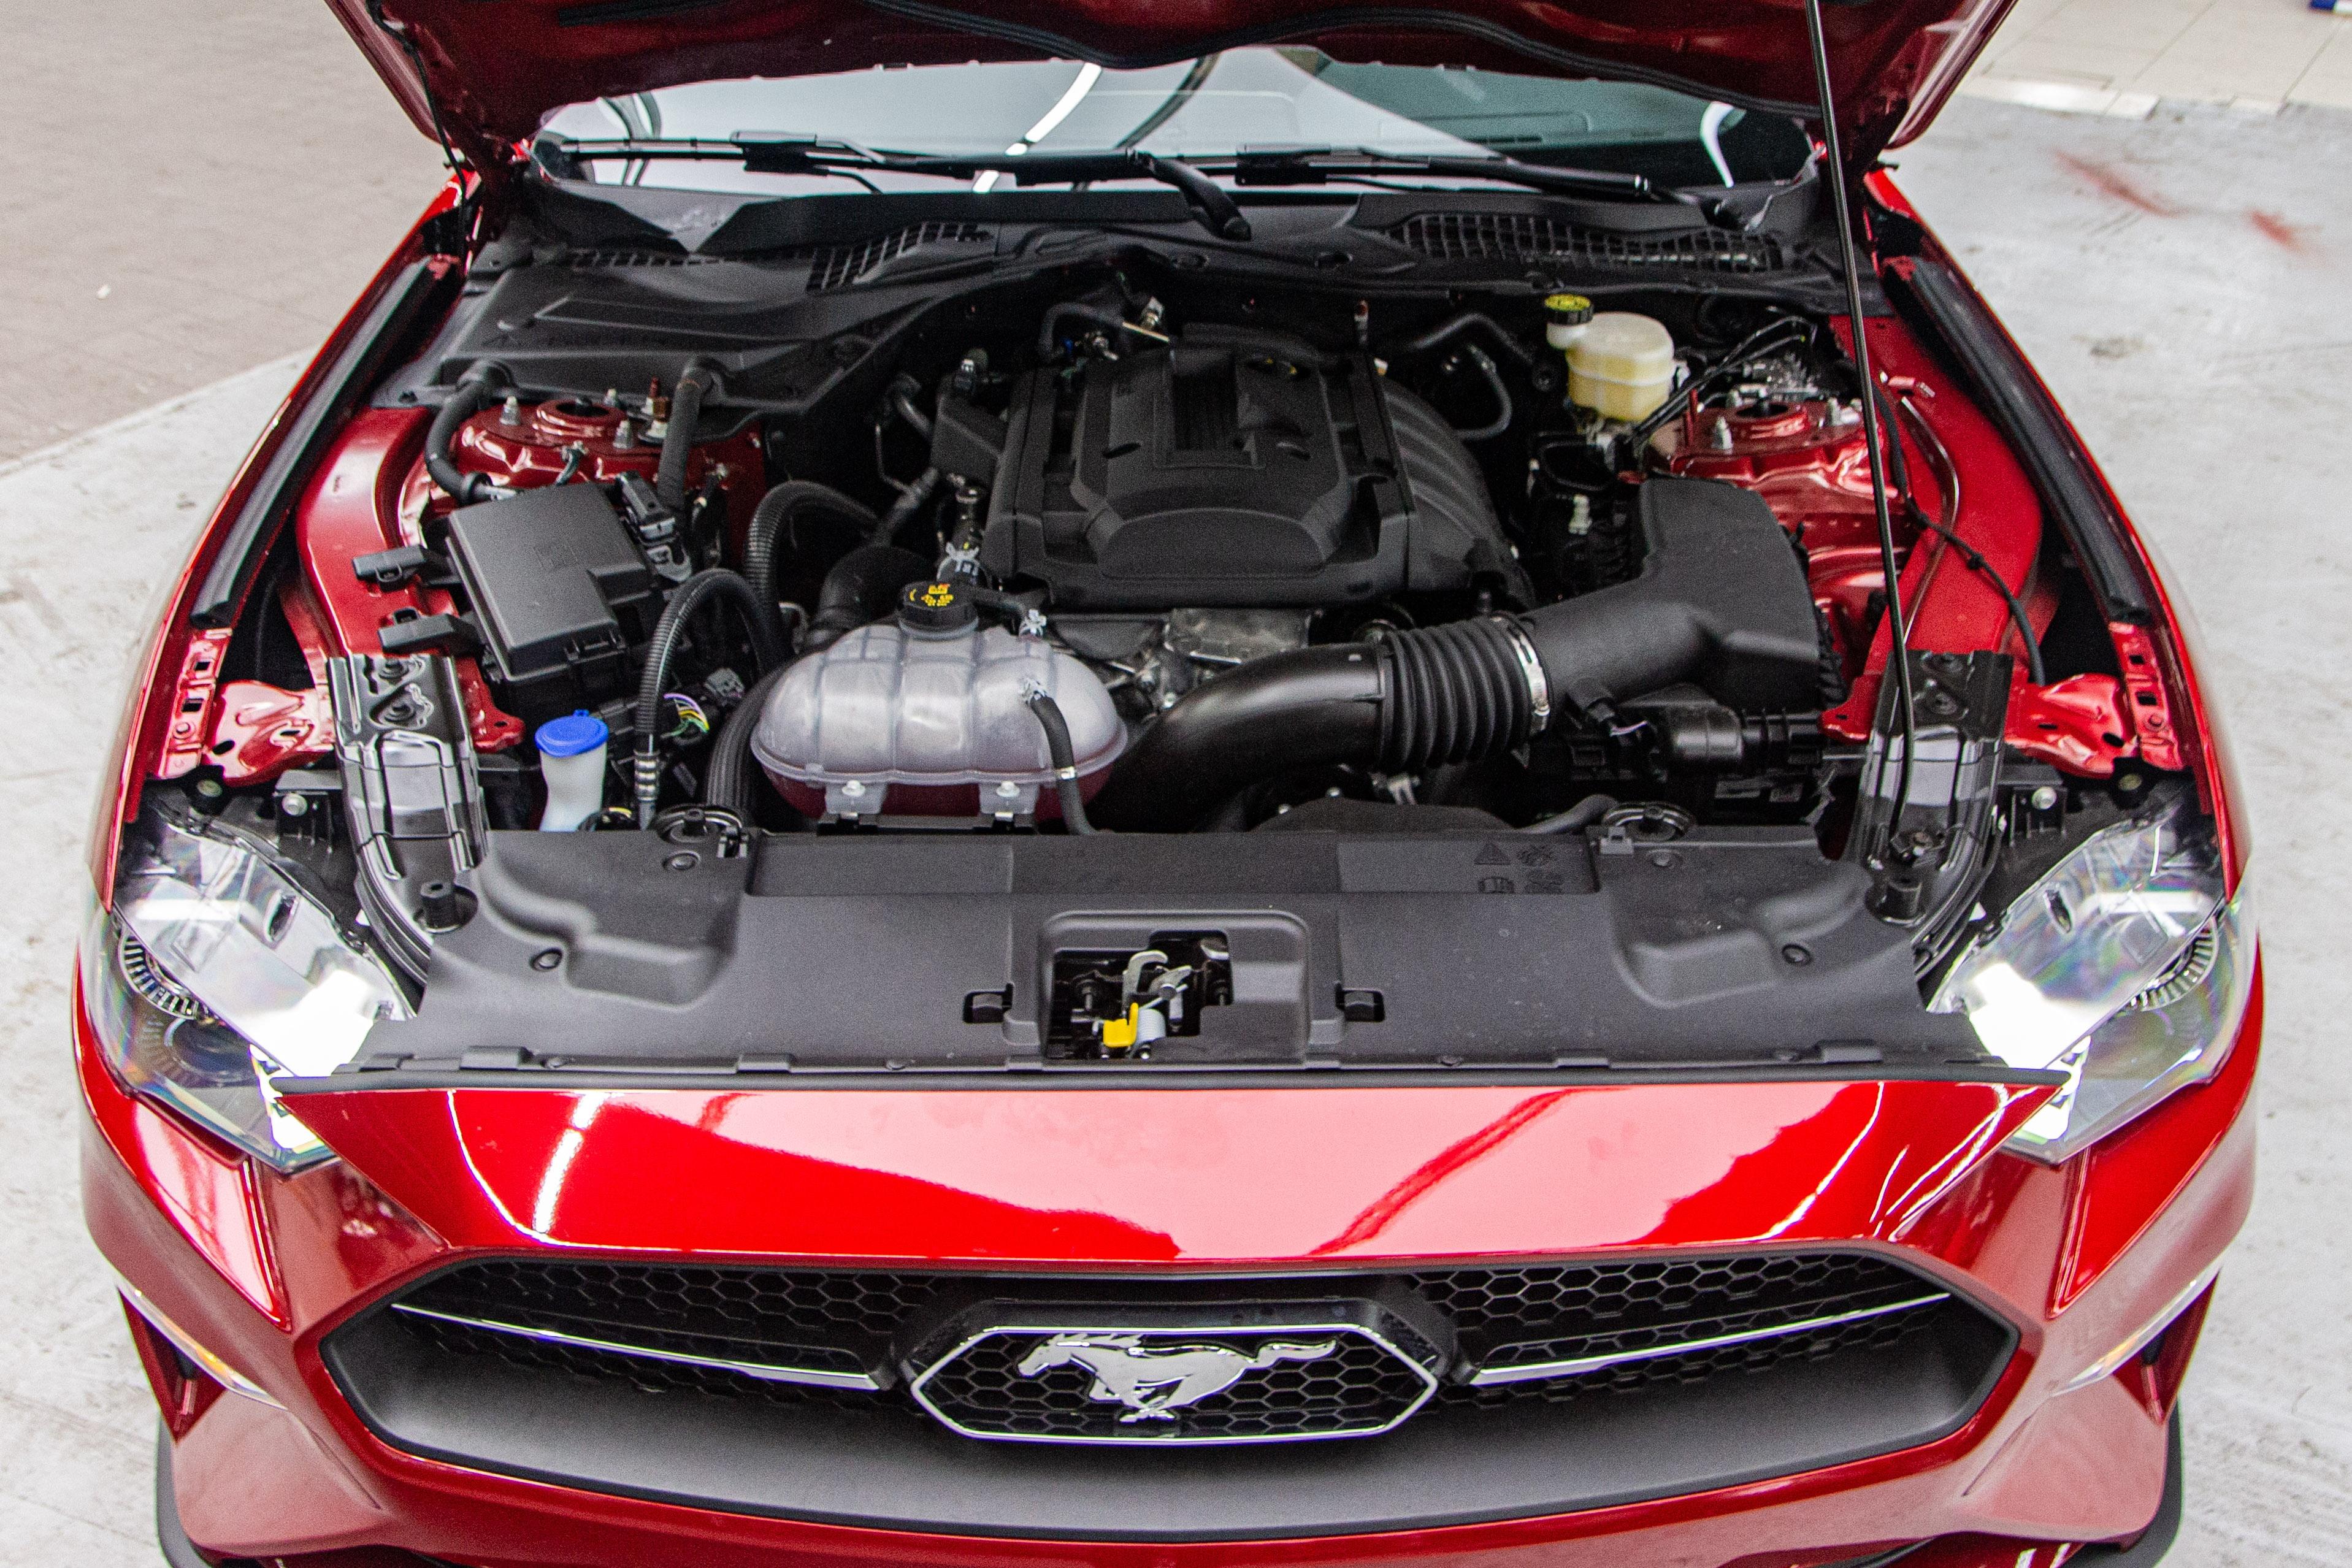 Ford Mustang 2020 phien ban ky niem vua ve VN, gia hon 3 ty hinh anh 36 Mustang_55_edition_zing_97_.jpg